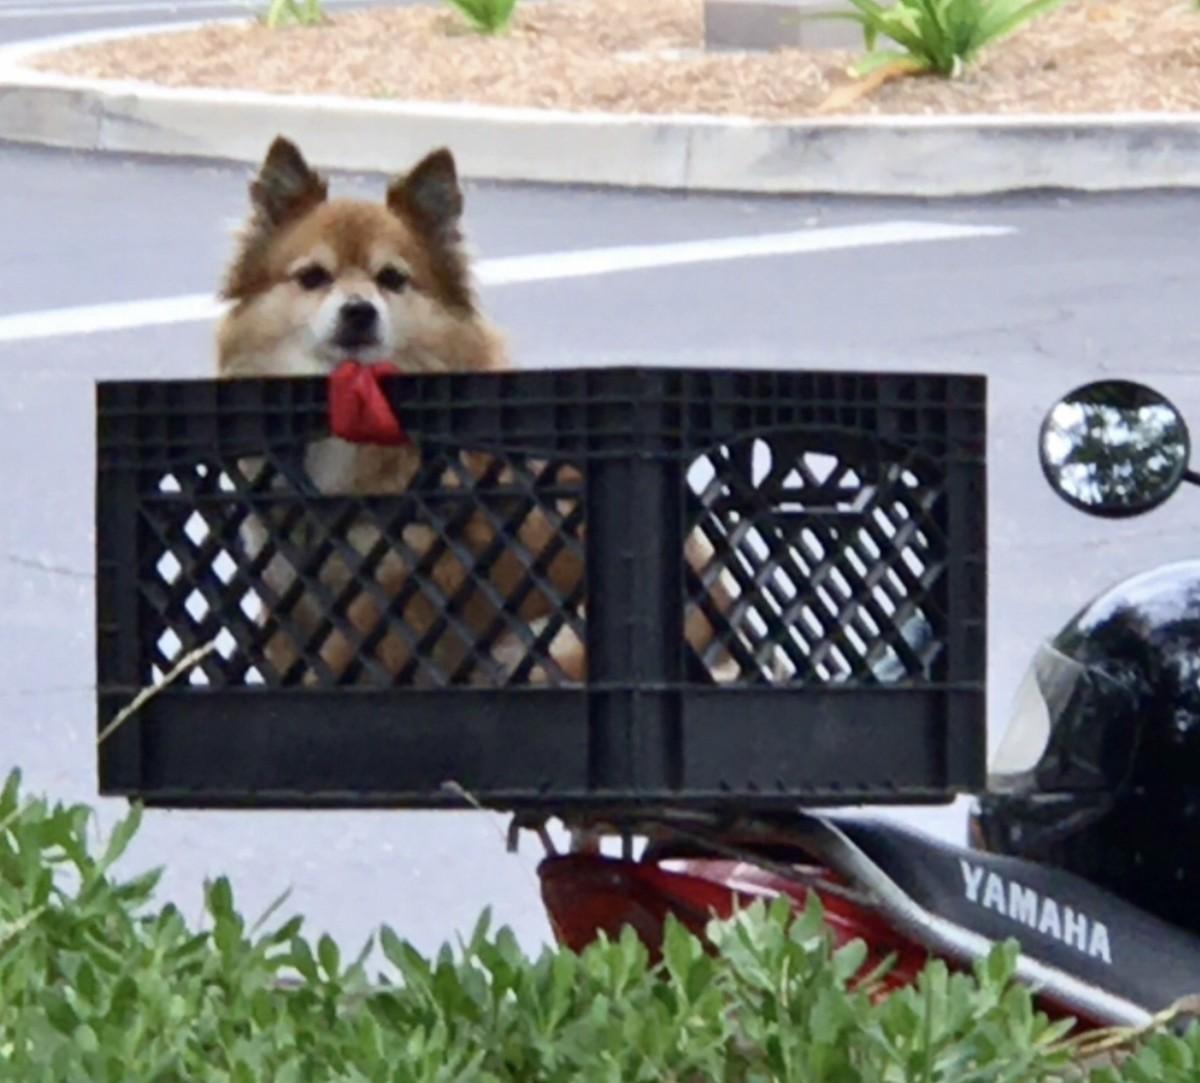 Canine Humor: The Dog in a Basket Poem